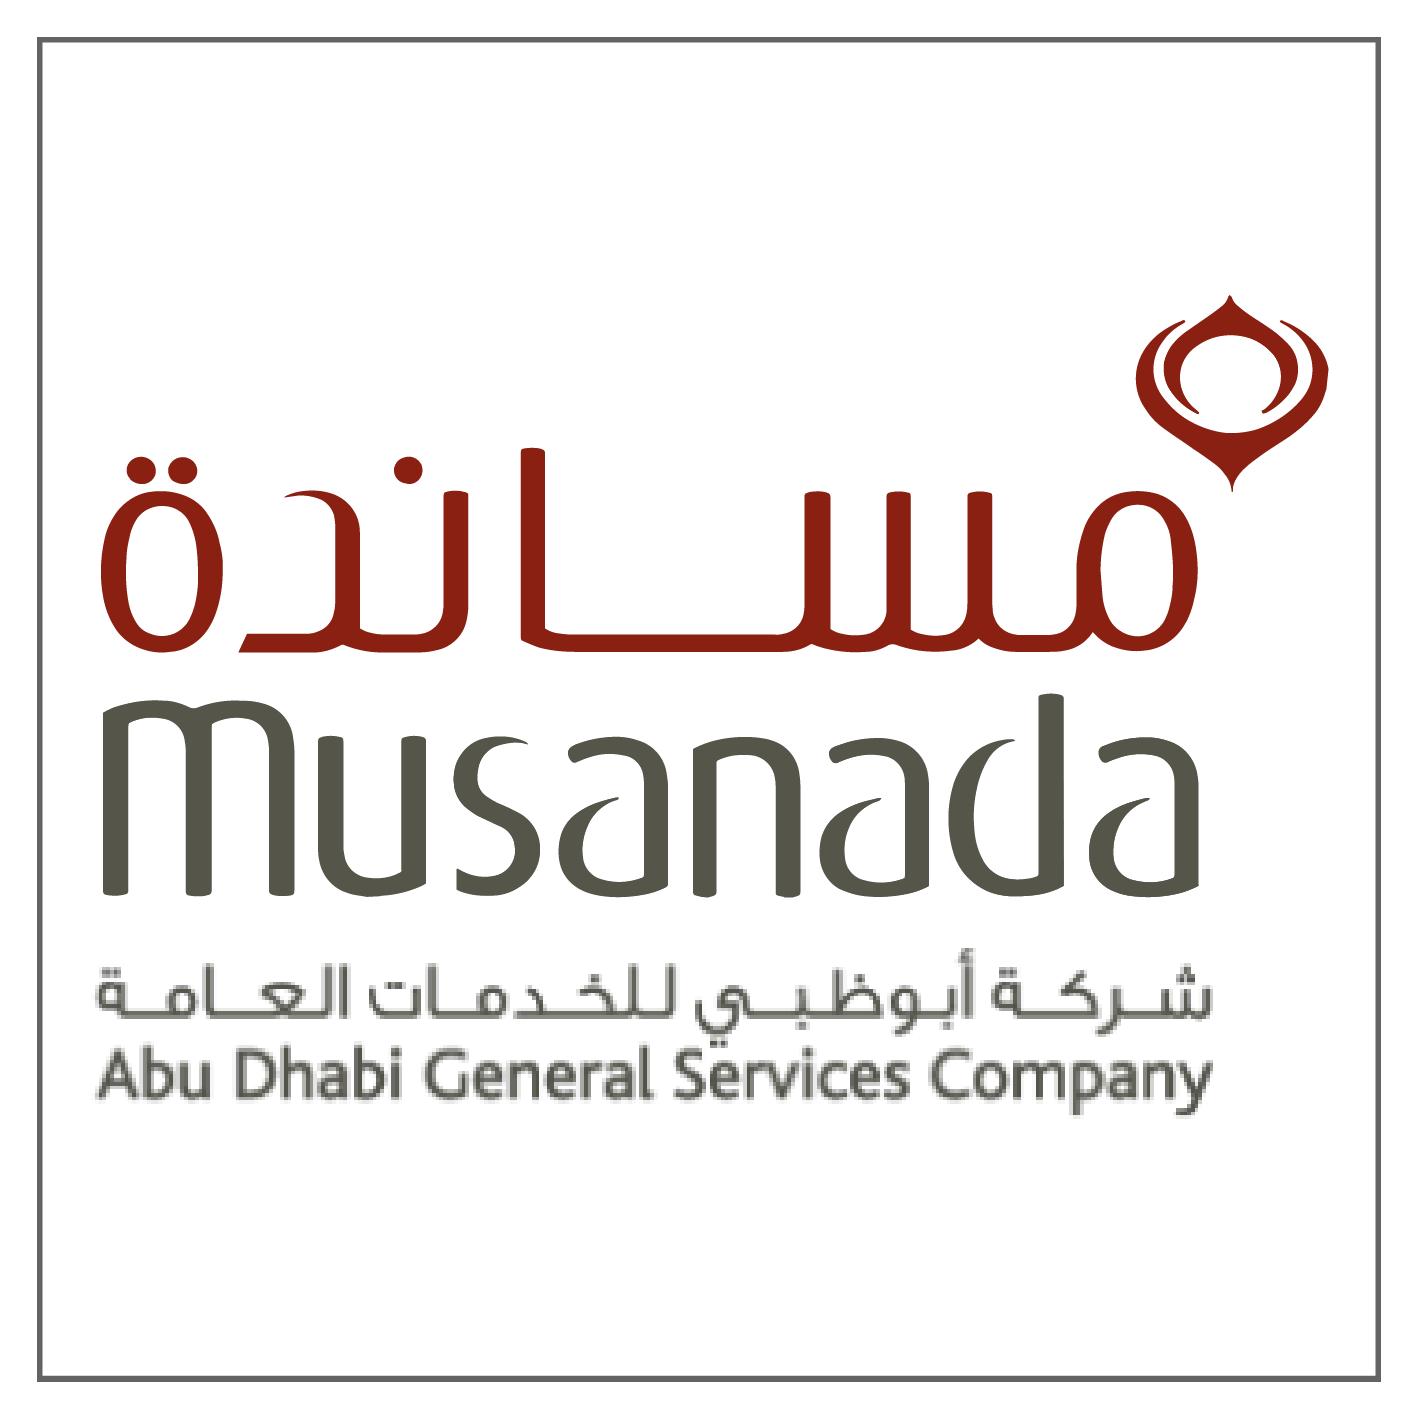 Musanada Logo